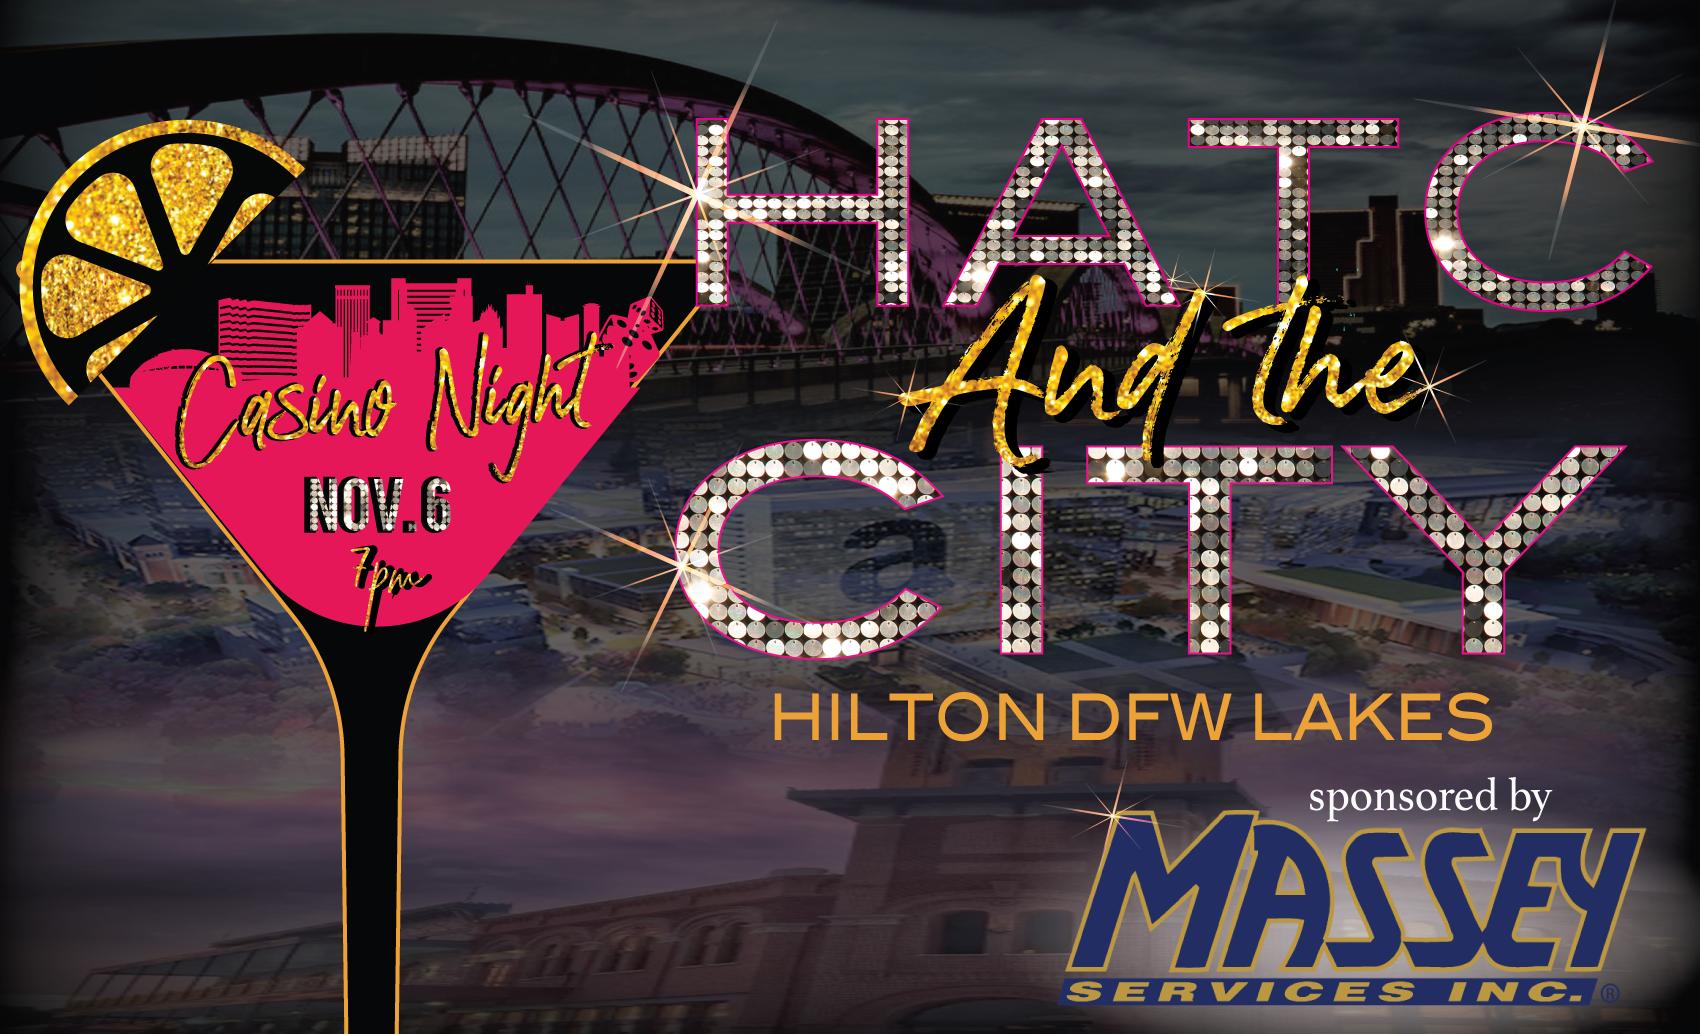 2021 Casino Night – HATC and the City